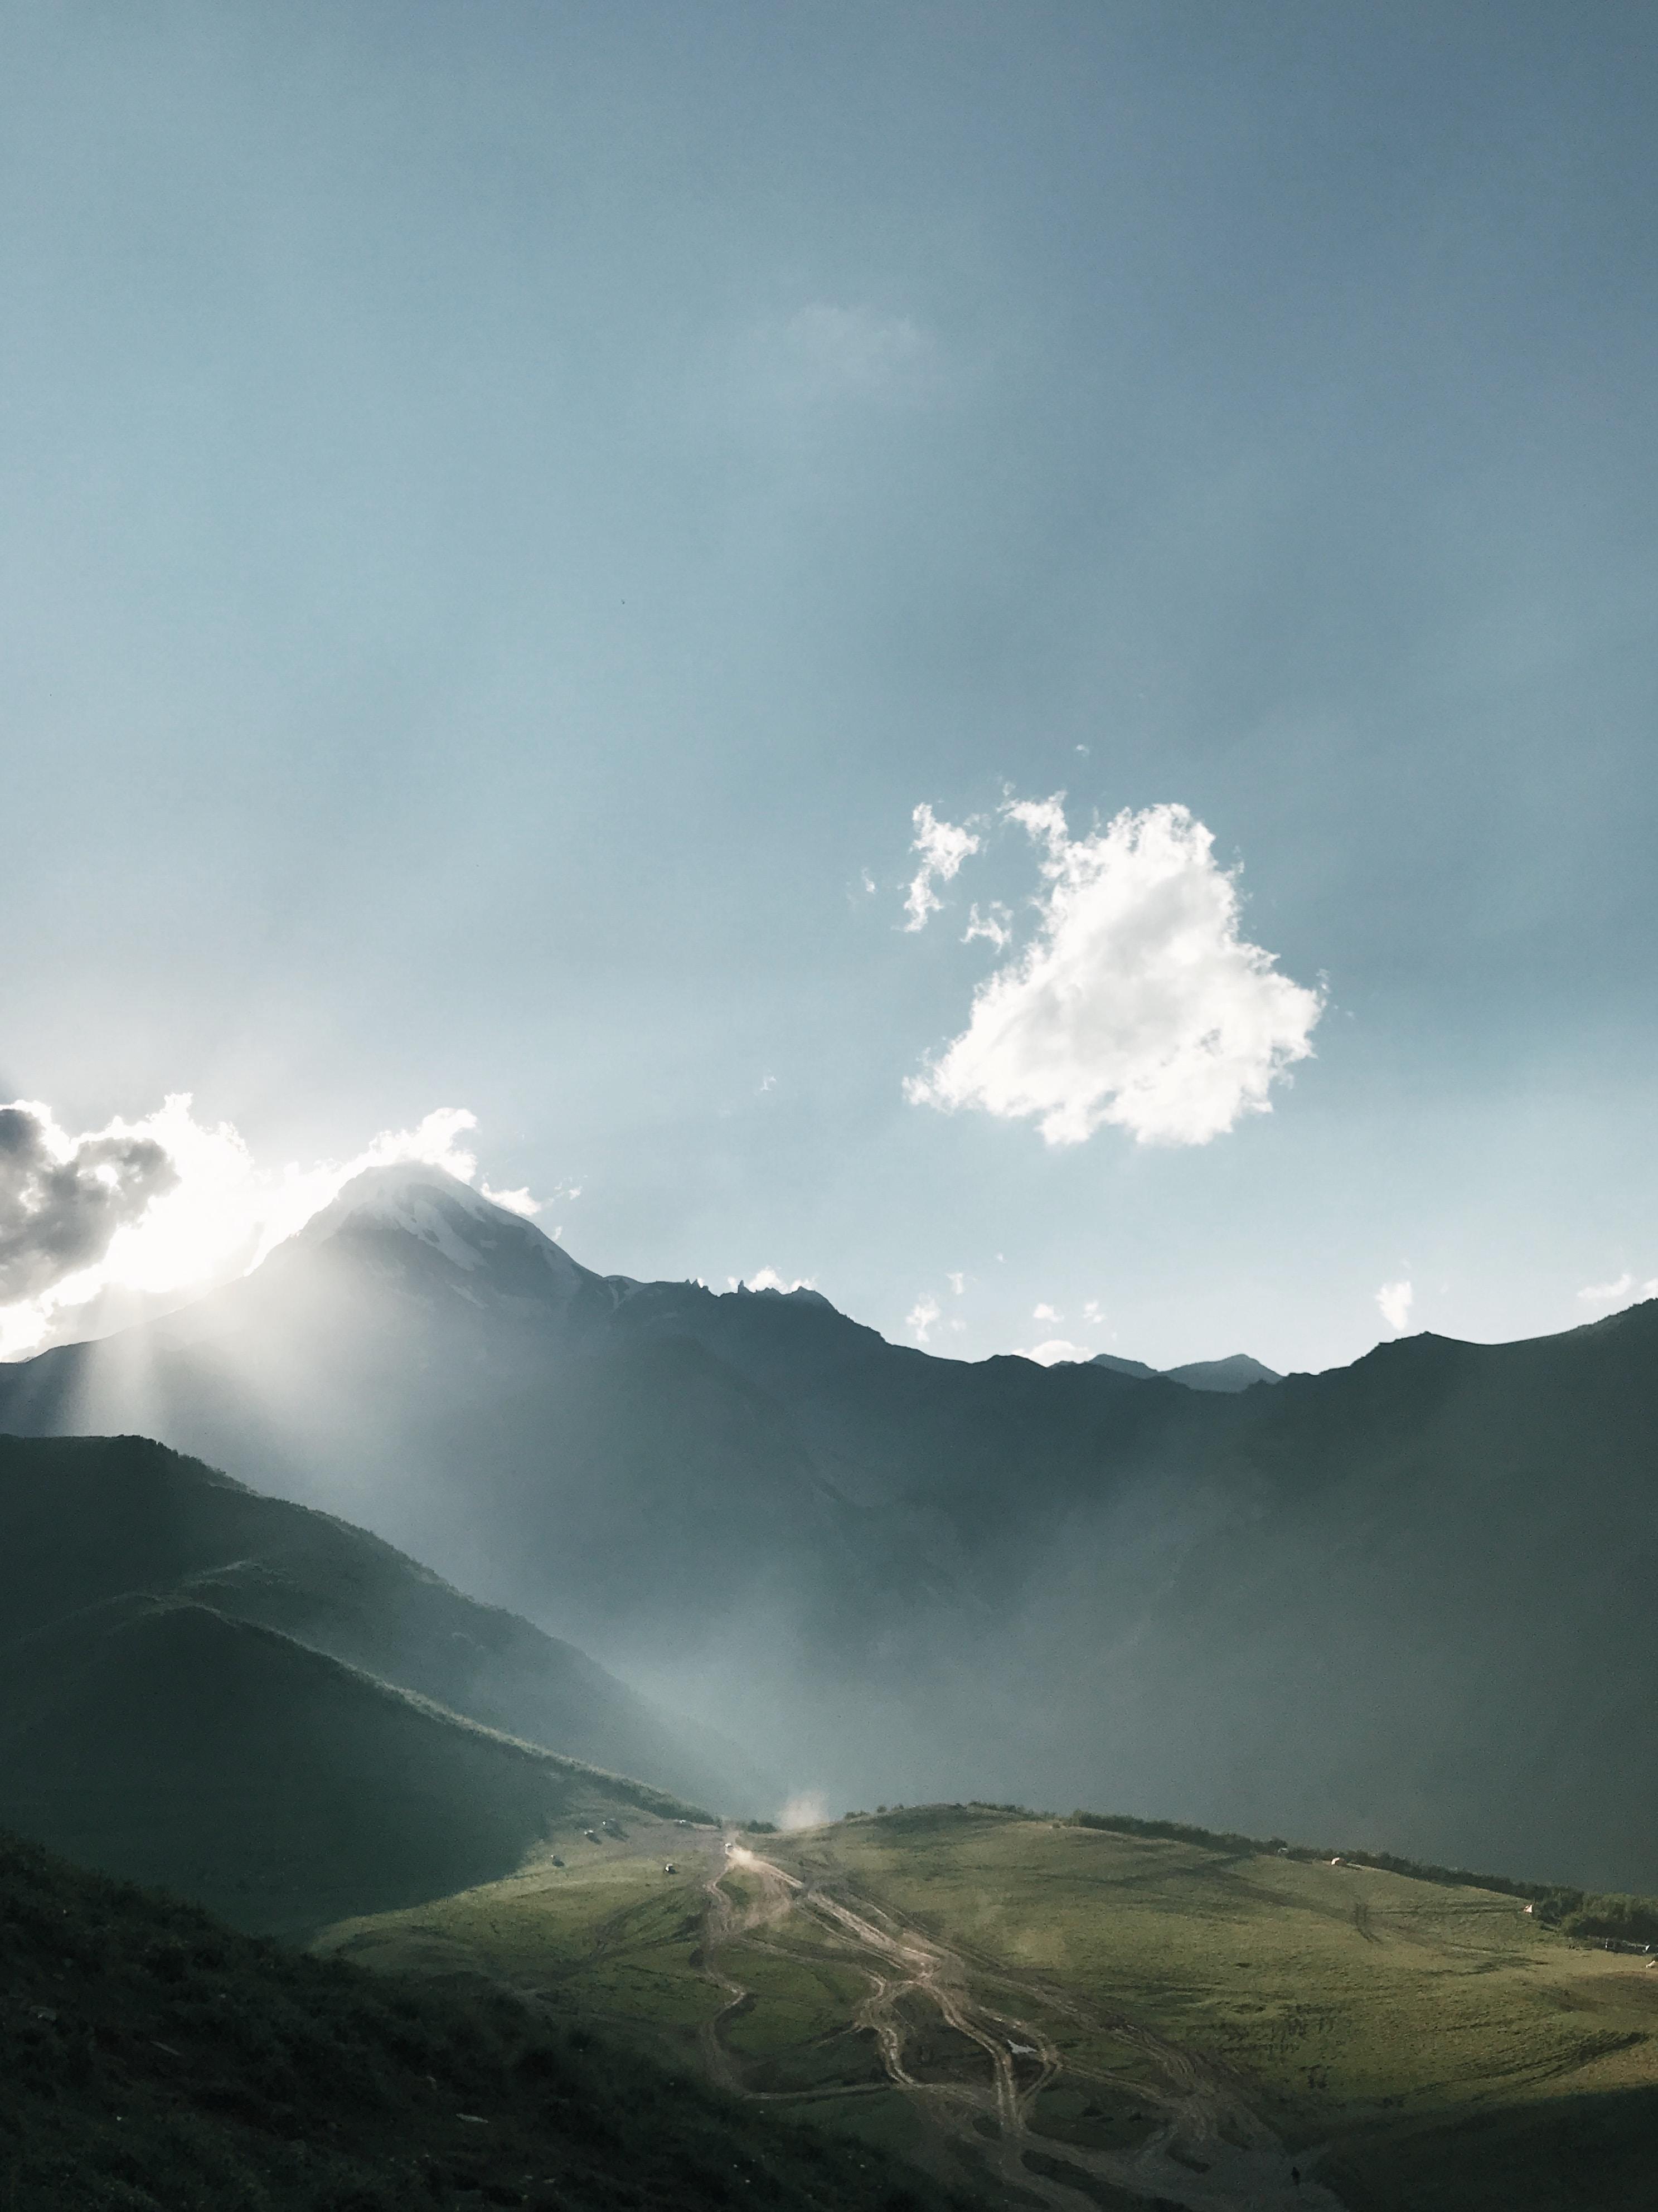 mountain under clear blue sky